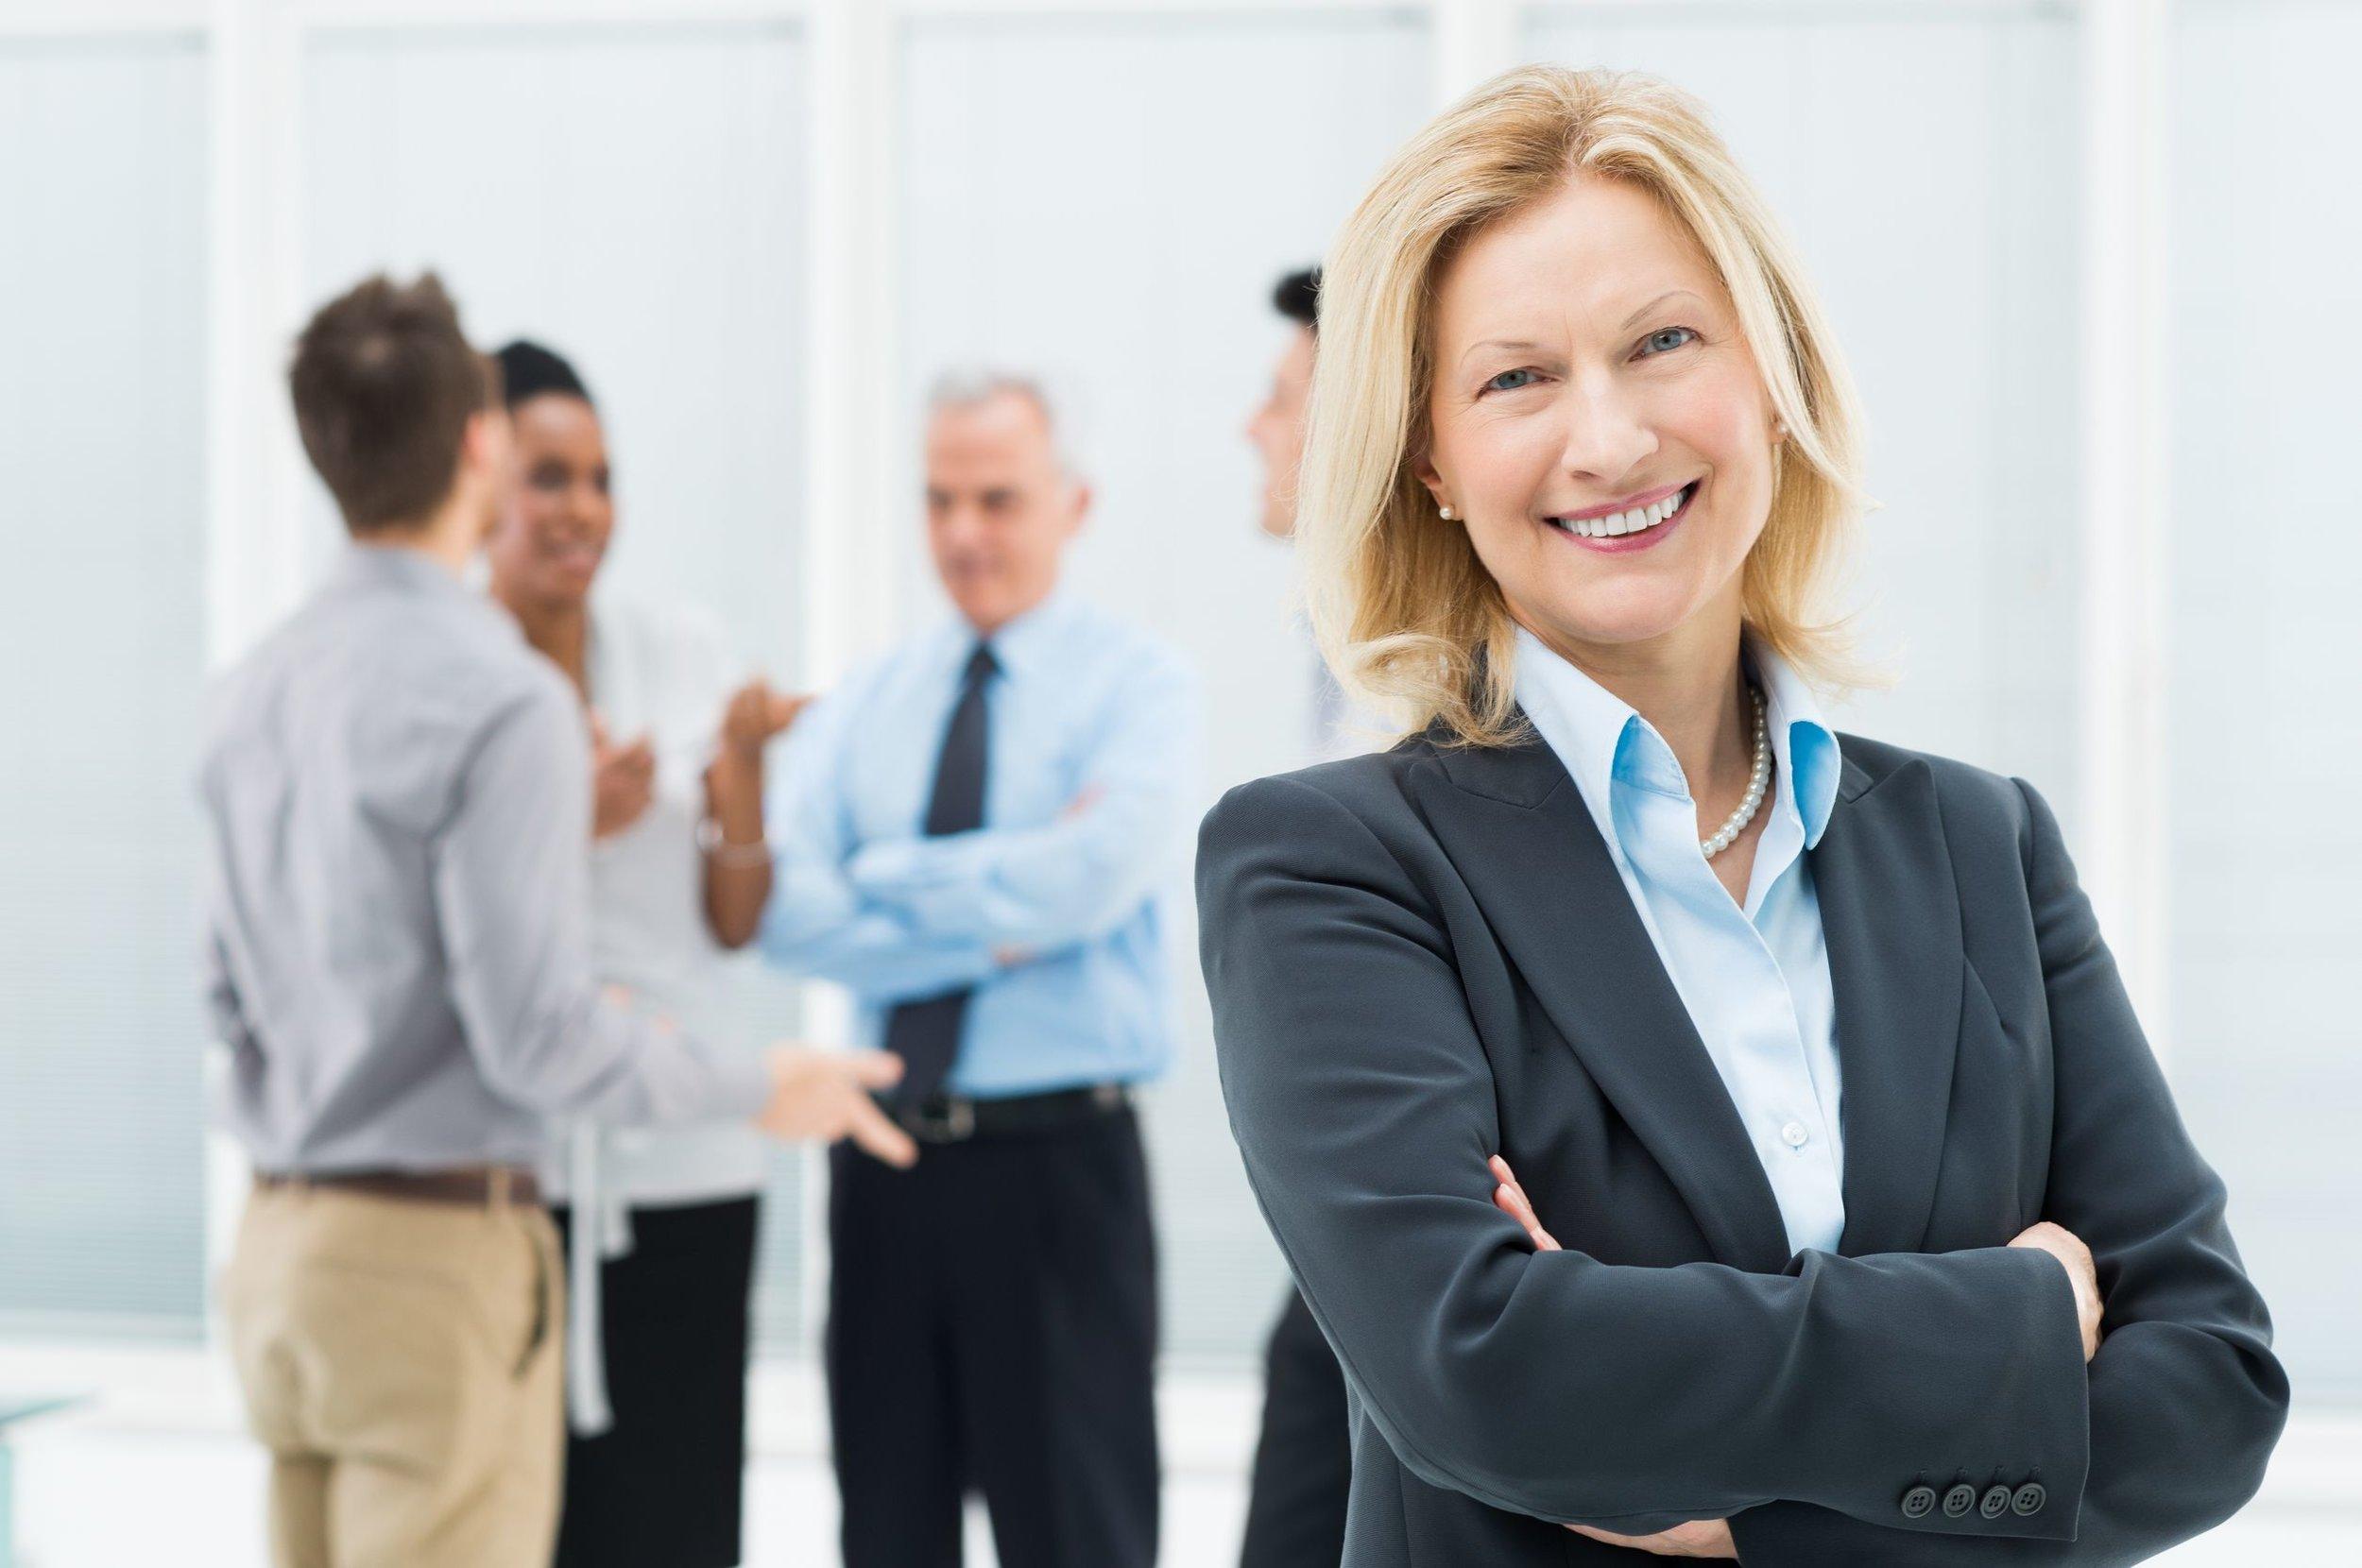 Smiling Business Woman.jpg